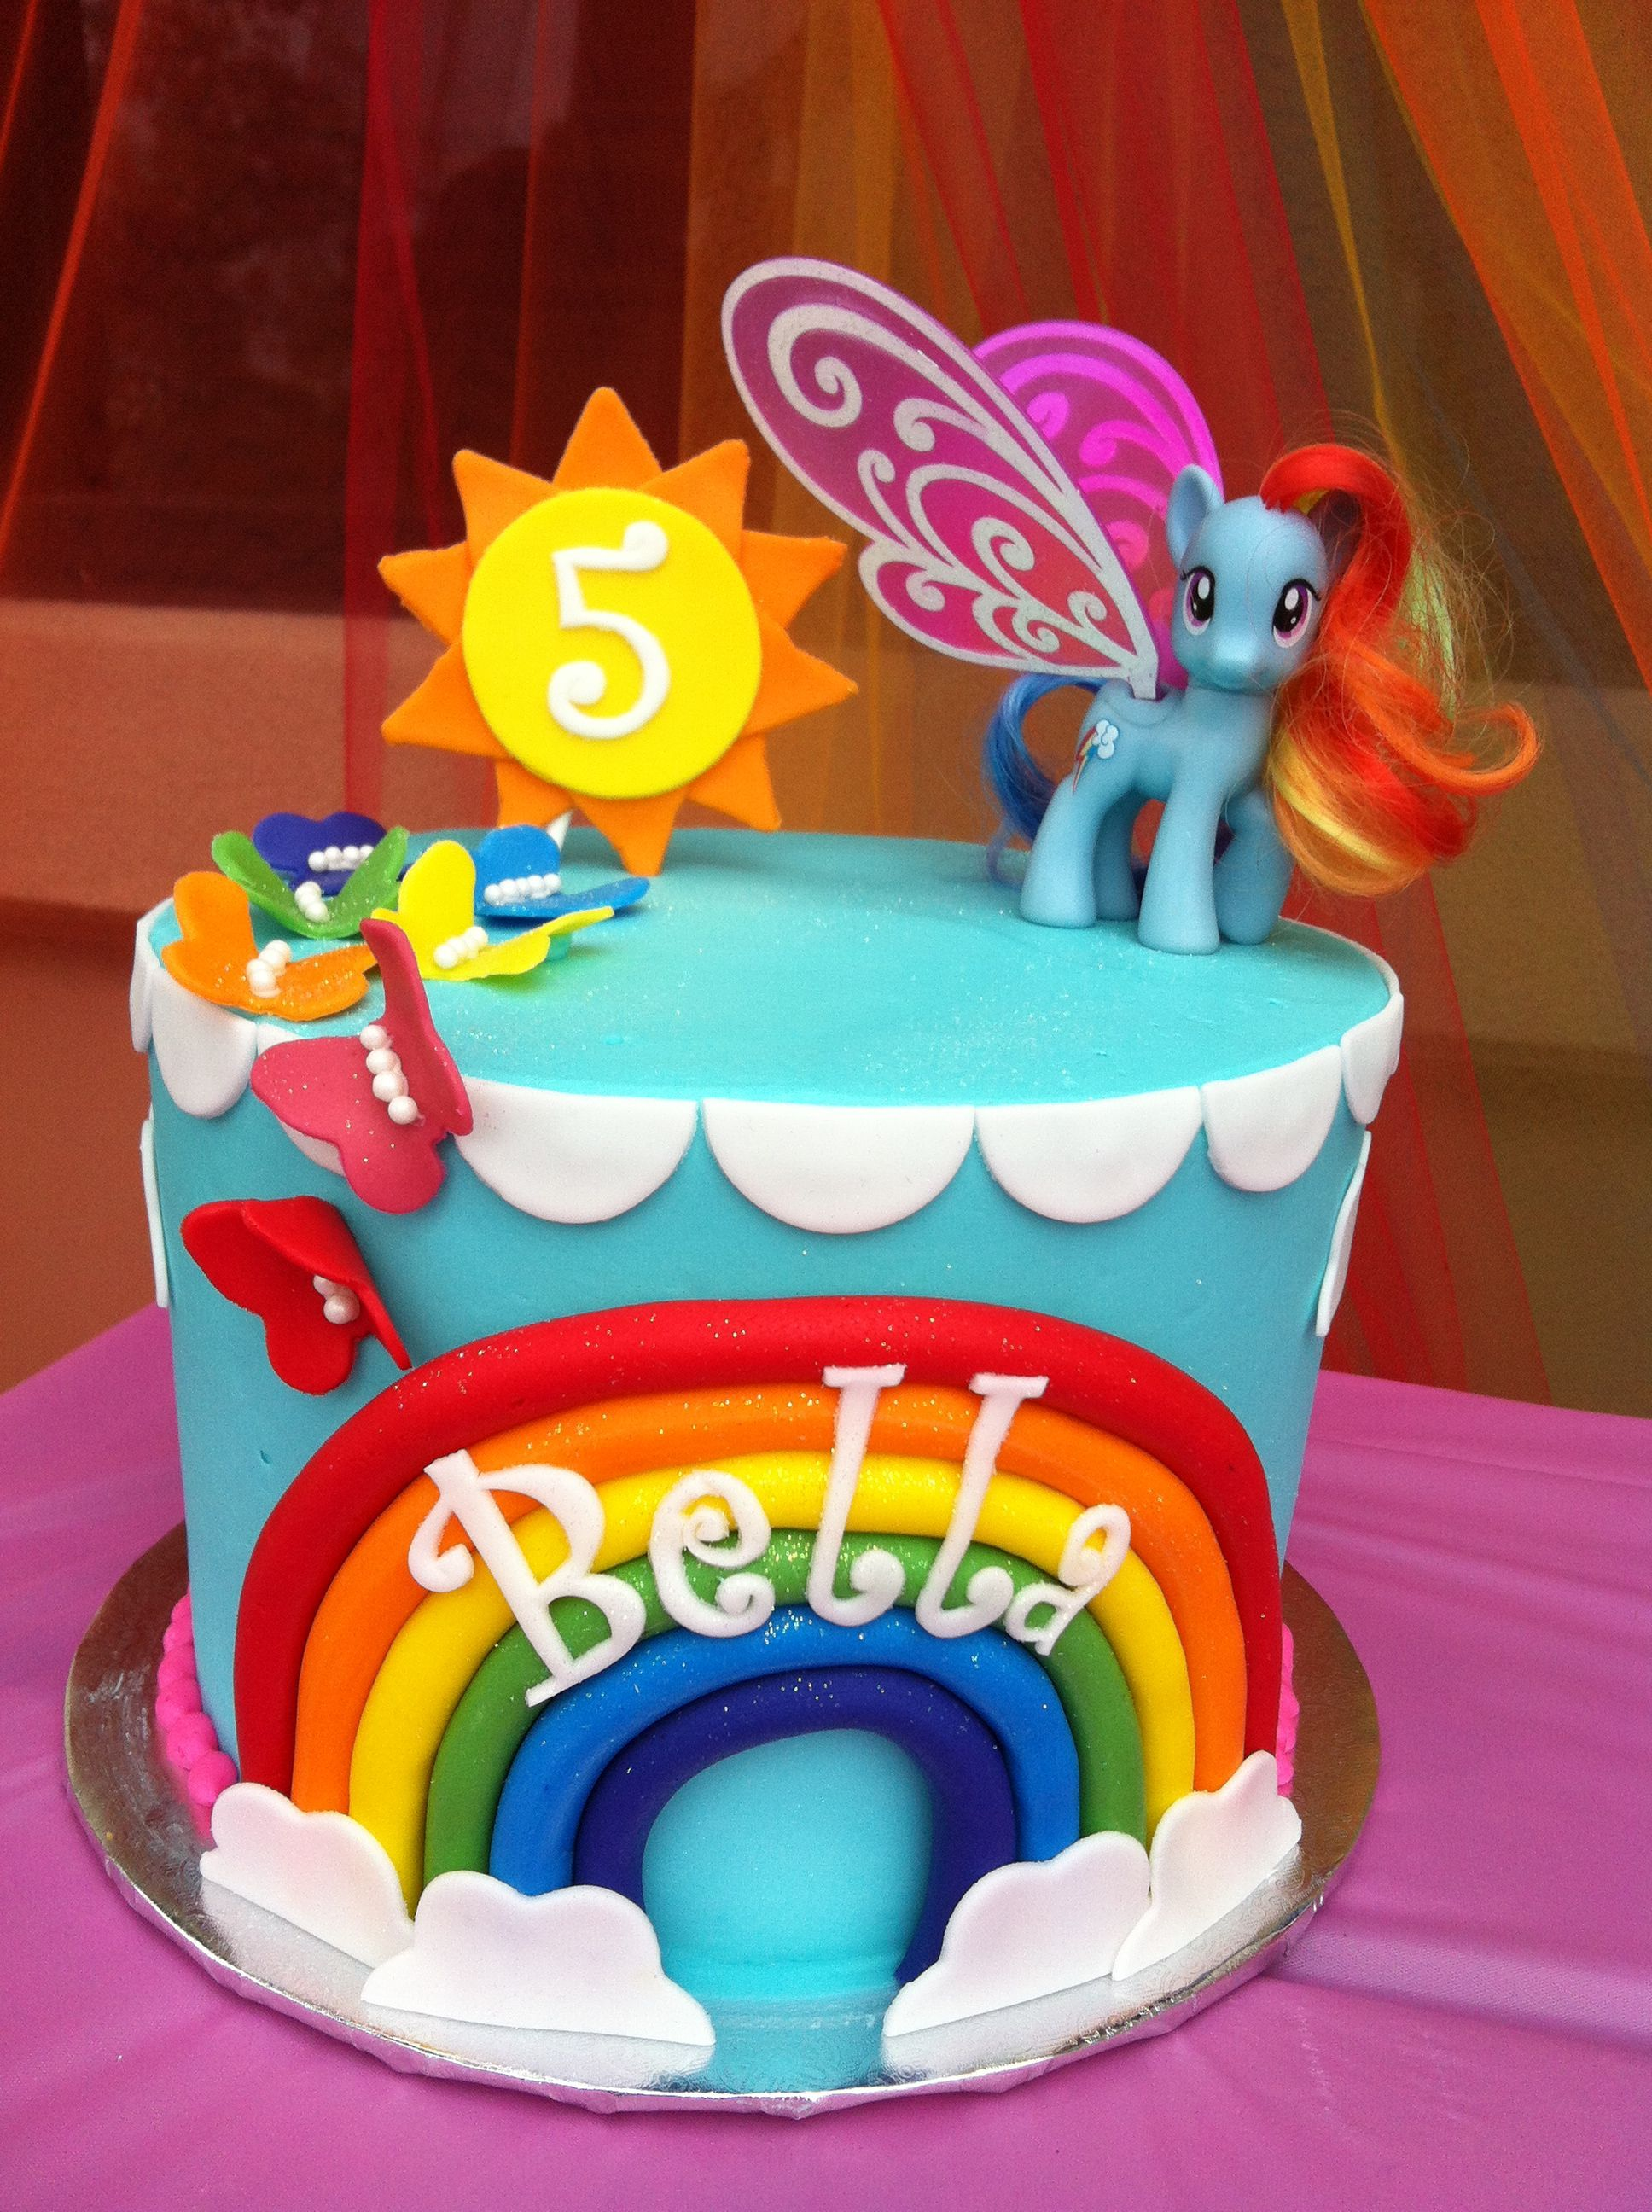 Phenomenal 35 Inspired Image Of Rainbow Dash Birthday Cake Rainbow Dash Funny Birthday Cards Online Fluifree Goldxyz